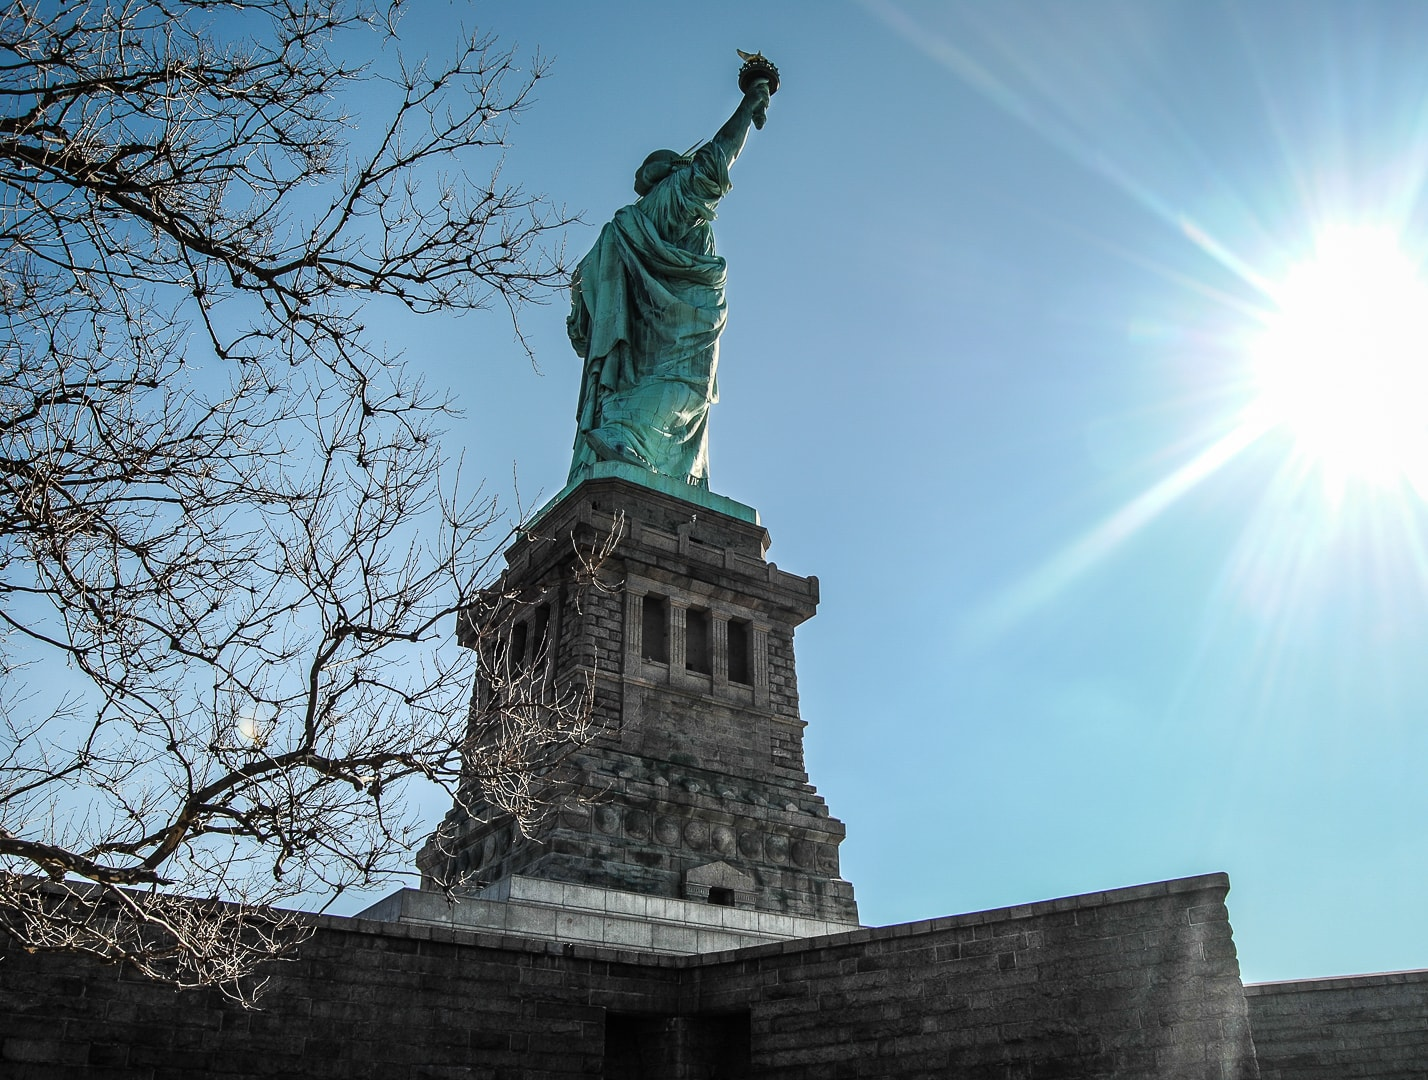 cliché de la statue de la liberté new york